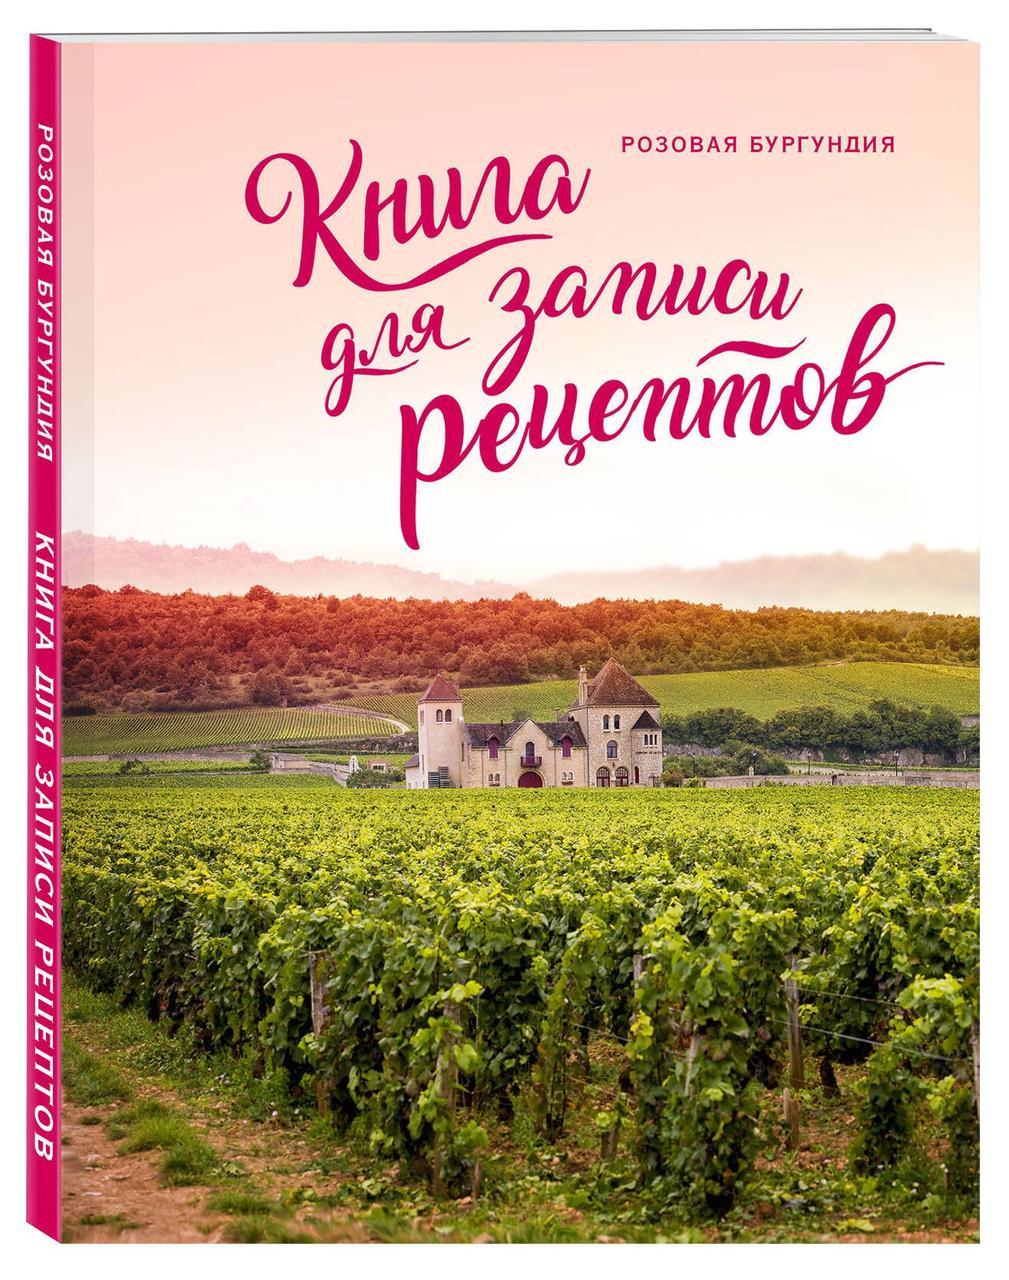 Книга для записи рецептов «Розовая Бургундия» (артикул 78003.15)